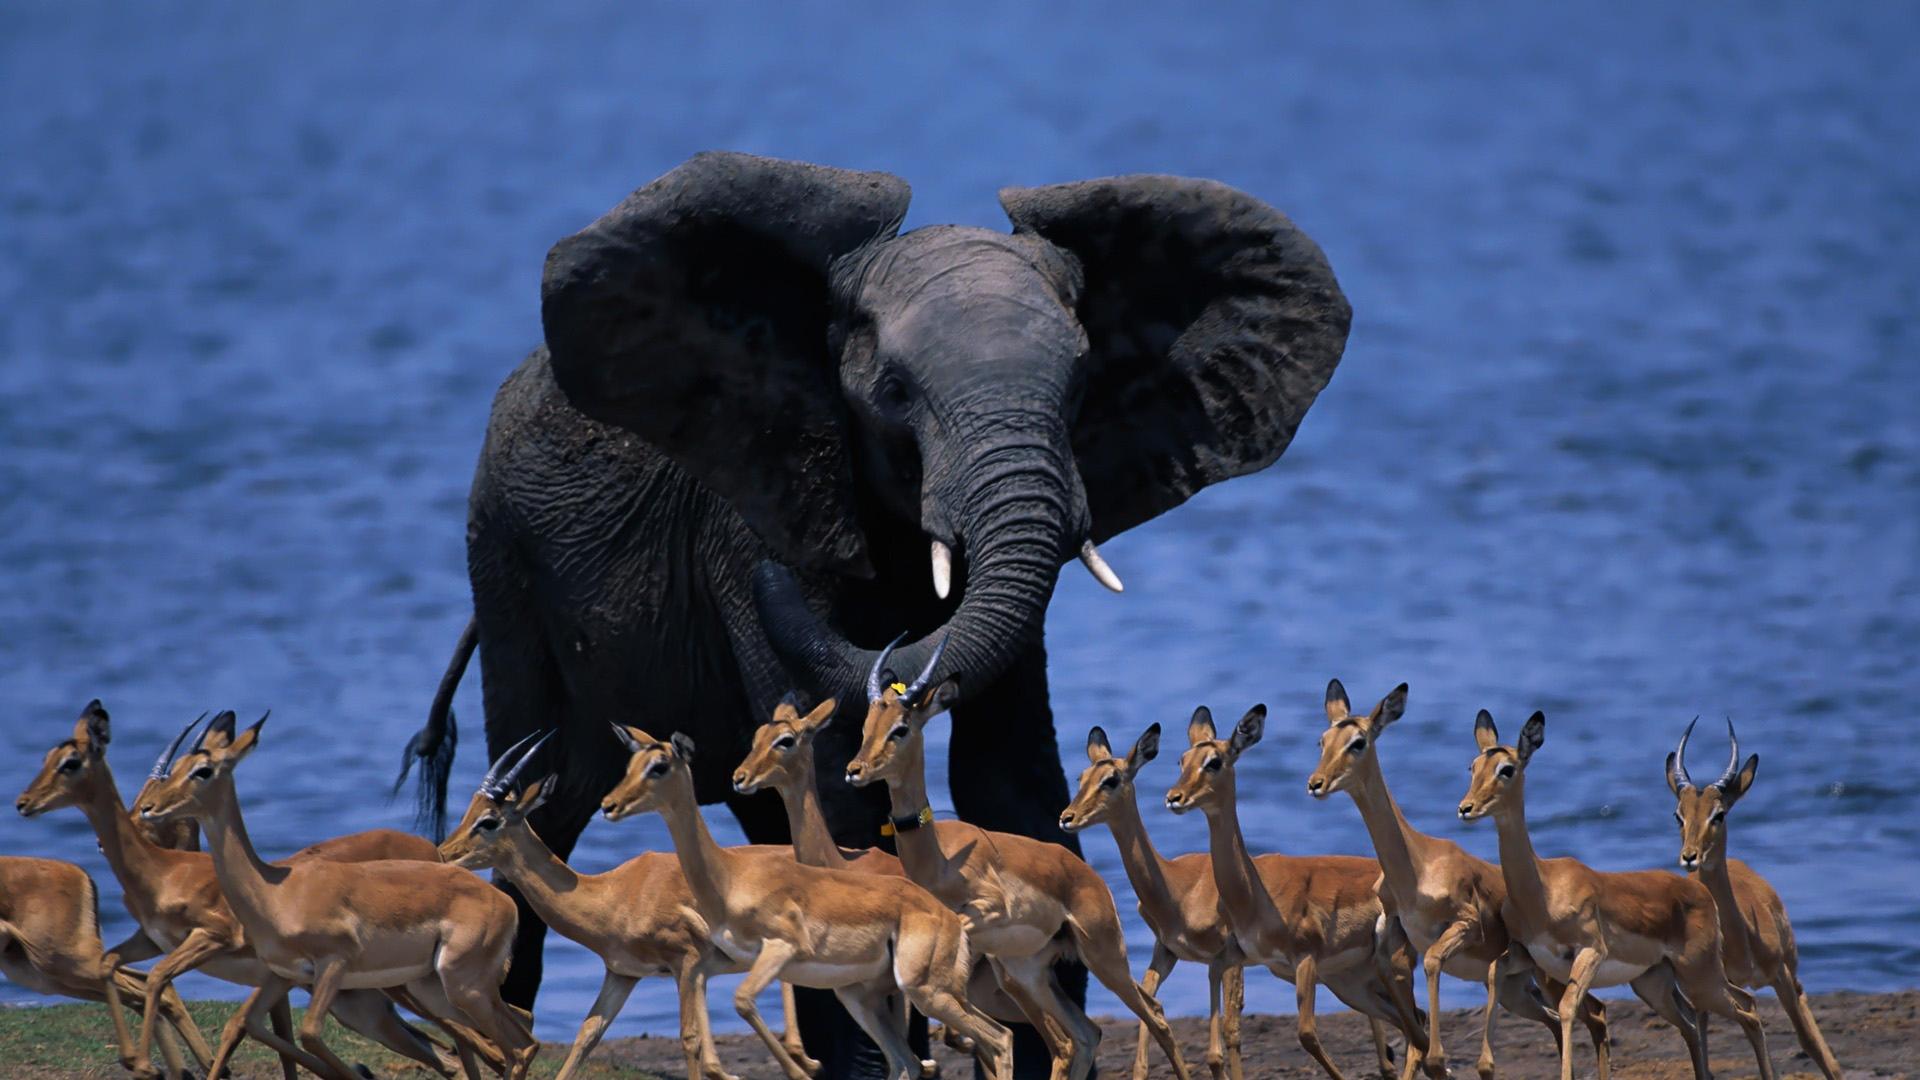 wildlife africa elephant duiker pygmy antelope run 1920x1080